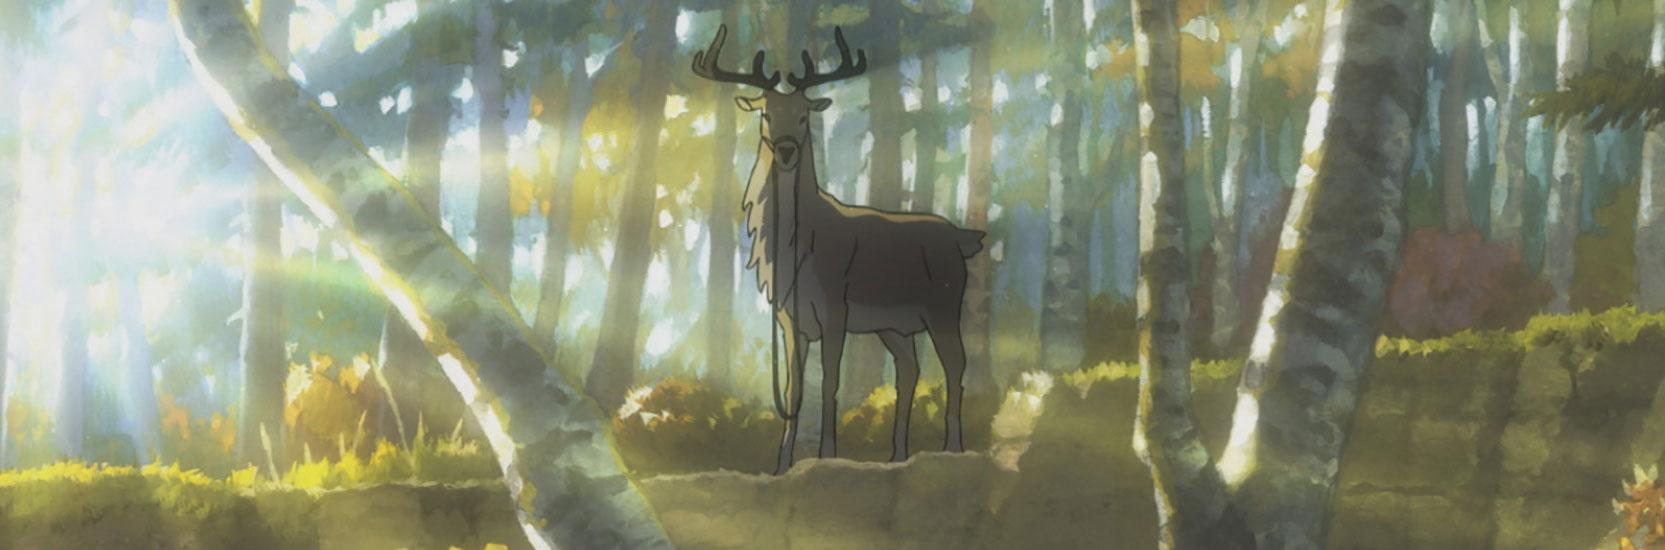 Critique – The Deer King